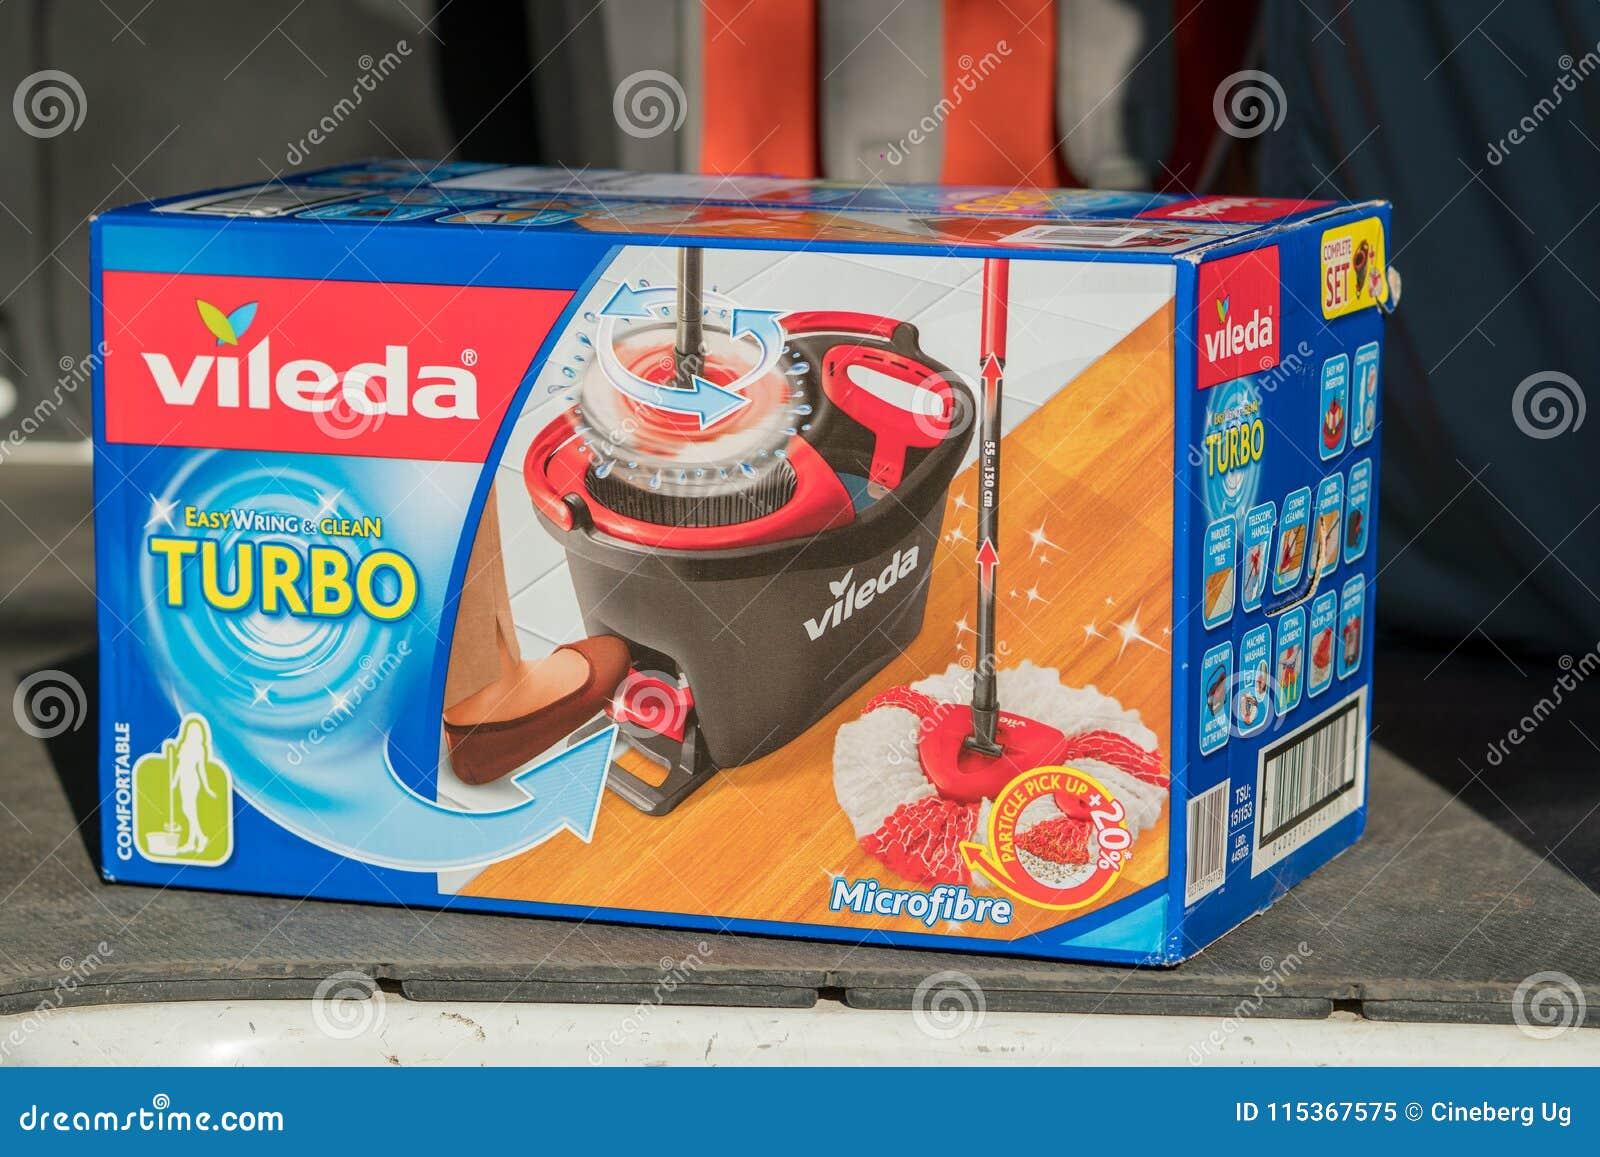 Vileda Turbo Mop Editorial Image Image Of Equipment 115367575